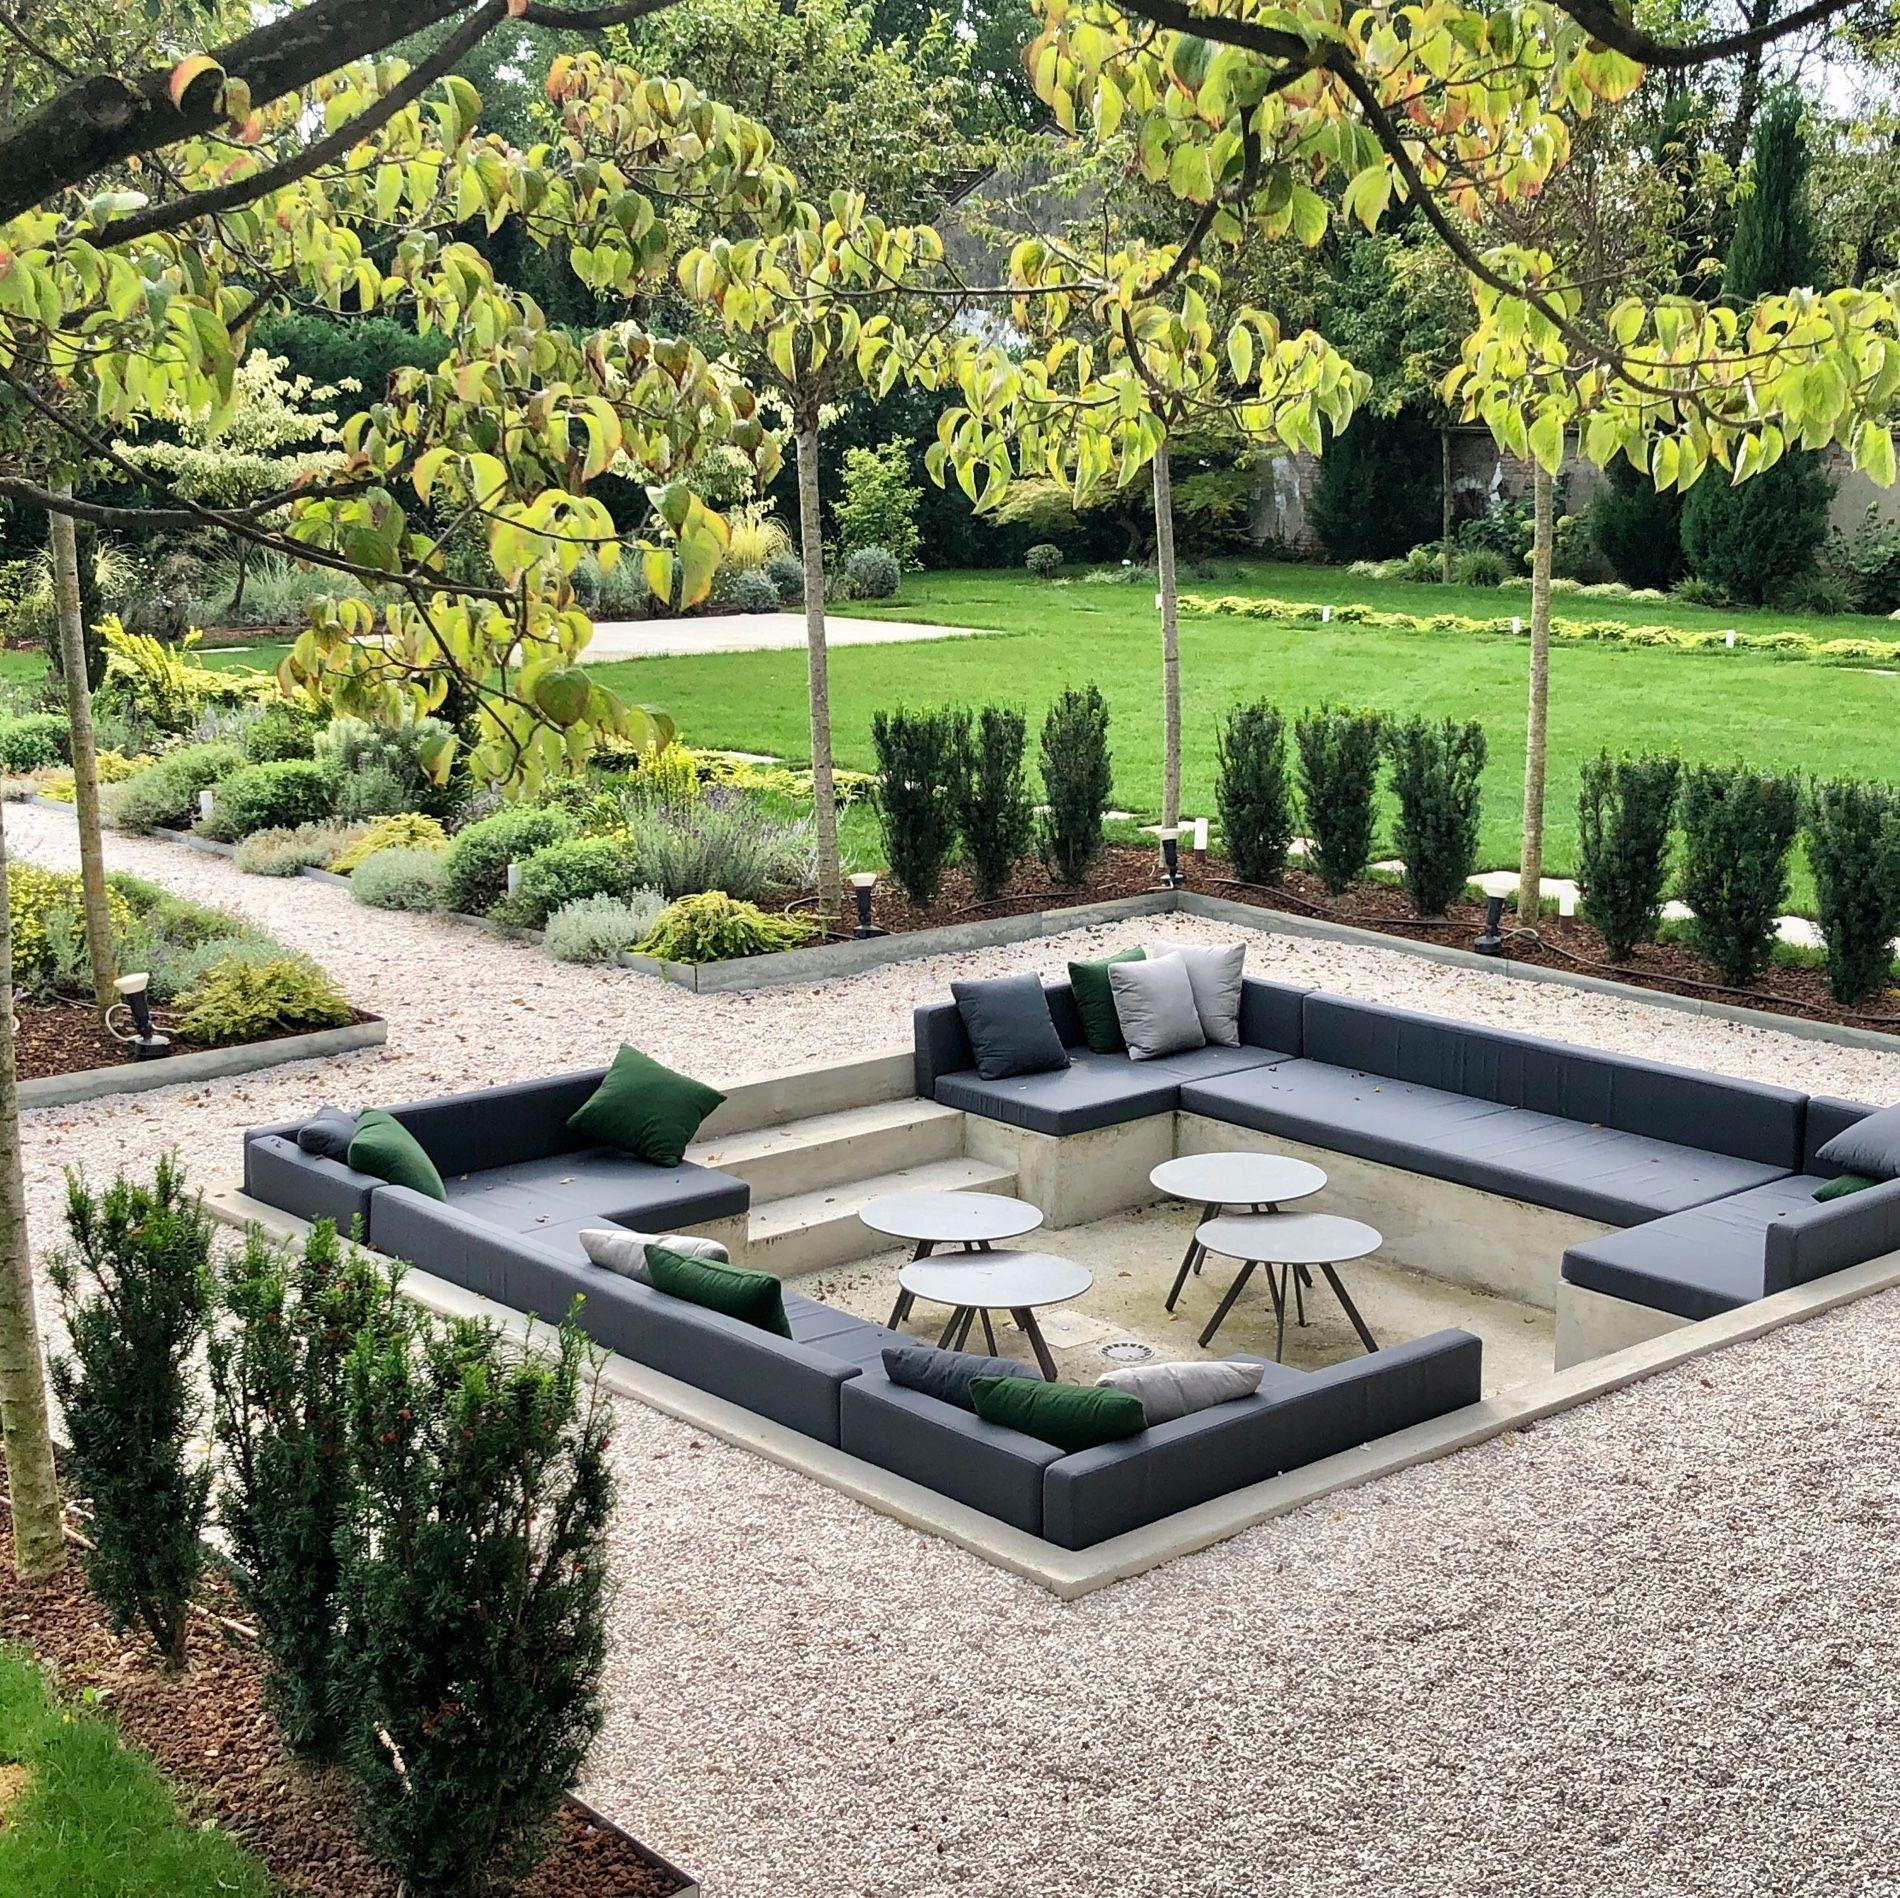 Carlo Crippa Picture Gallery Modern Patio Design Backyard Patio Designs Outdoor Gardens Design